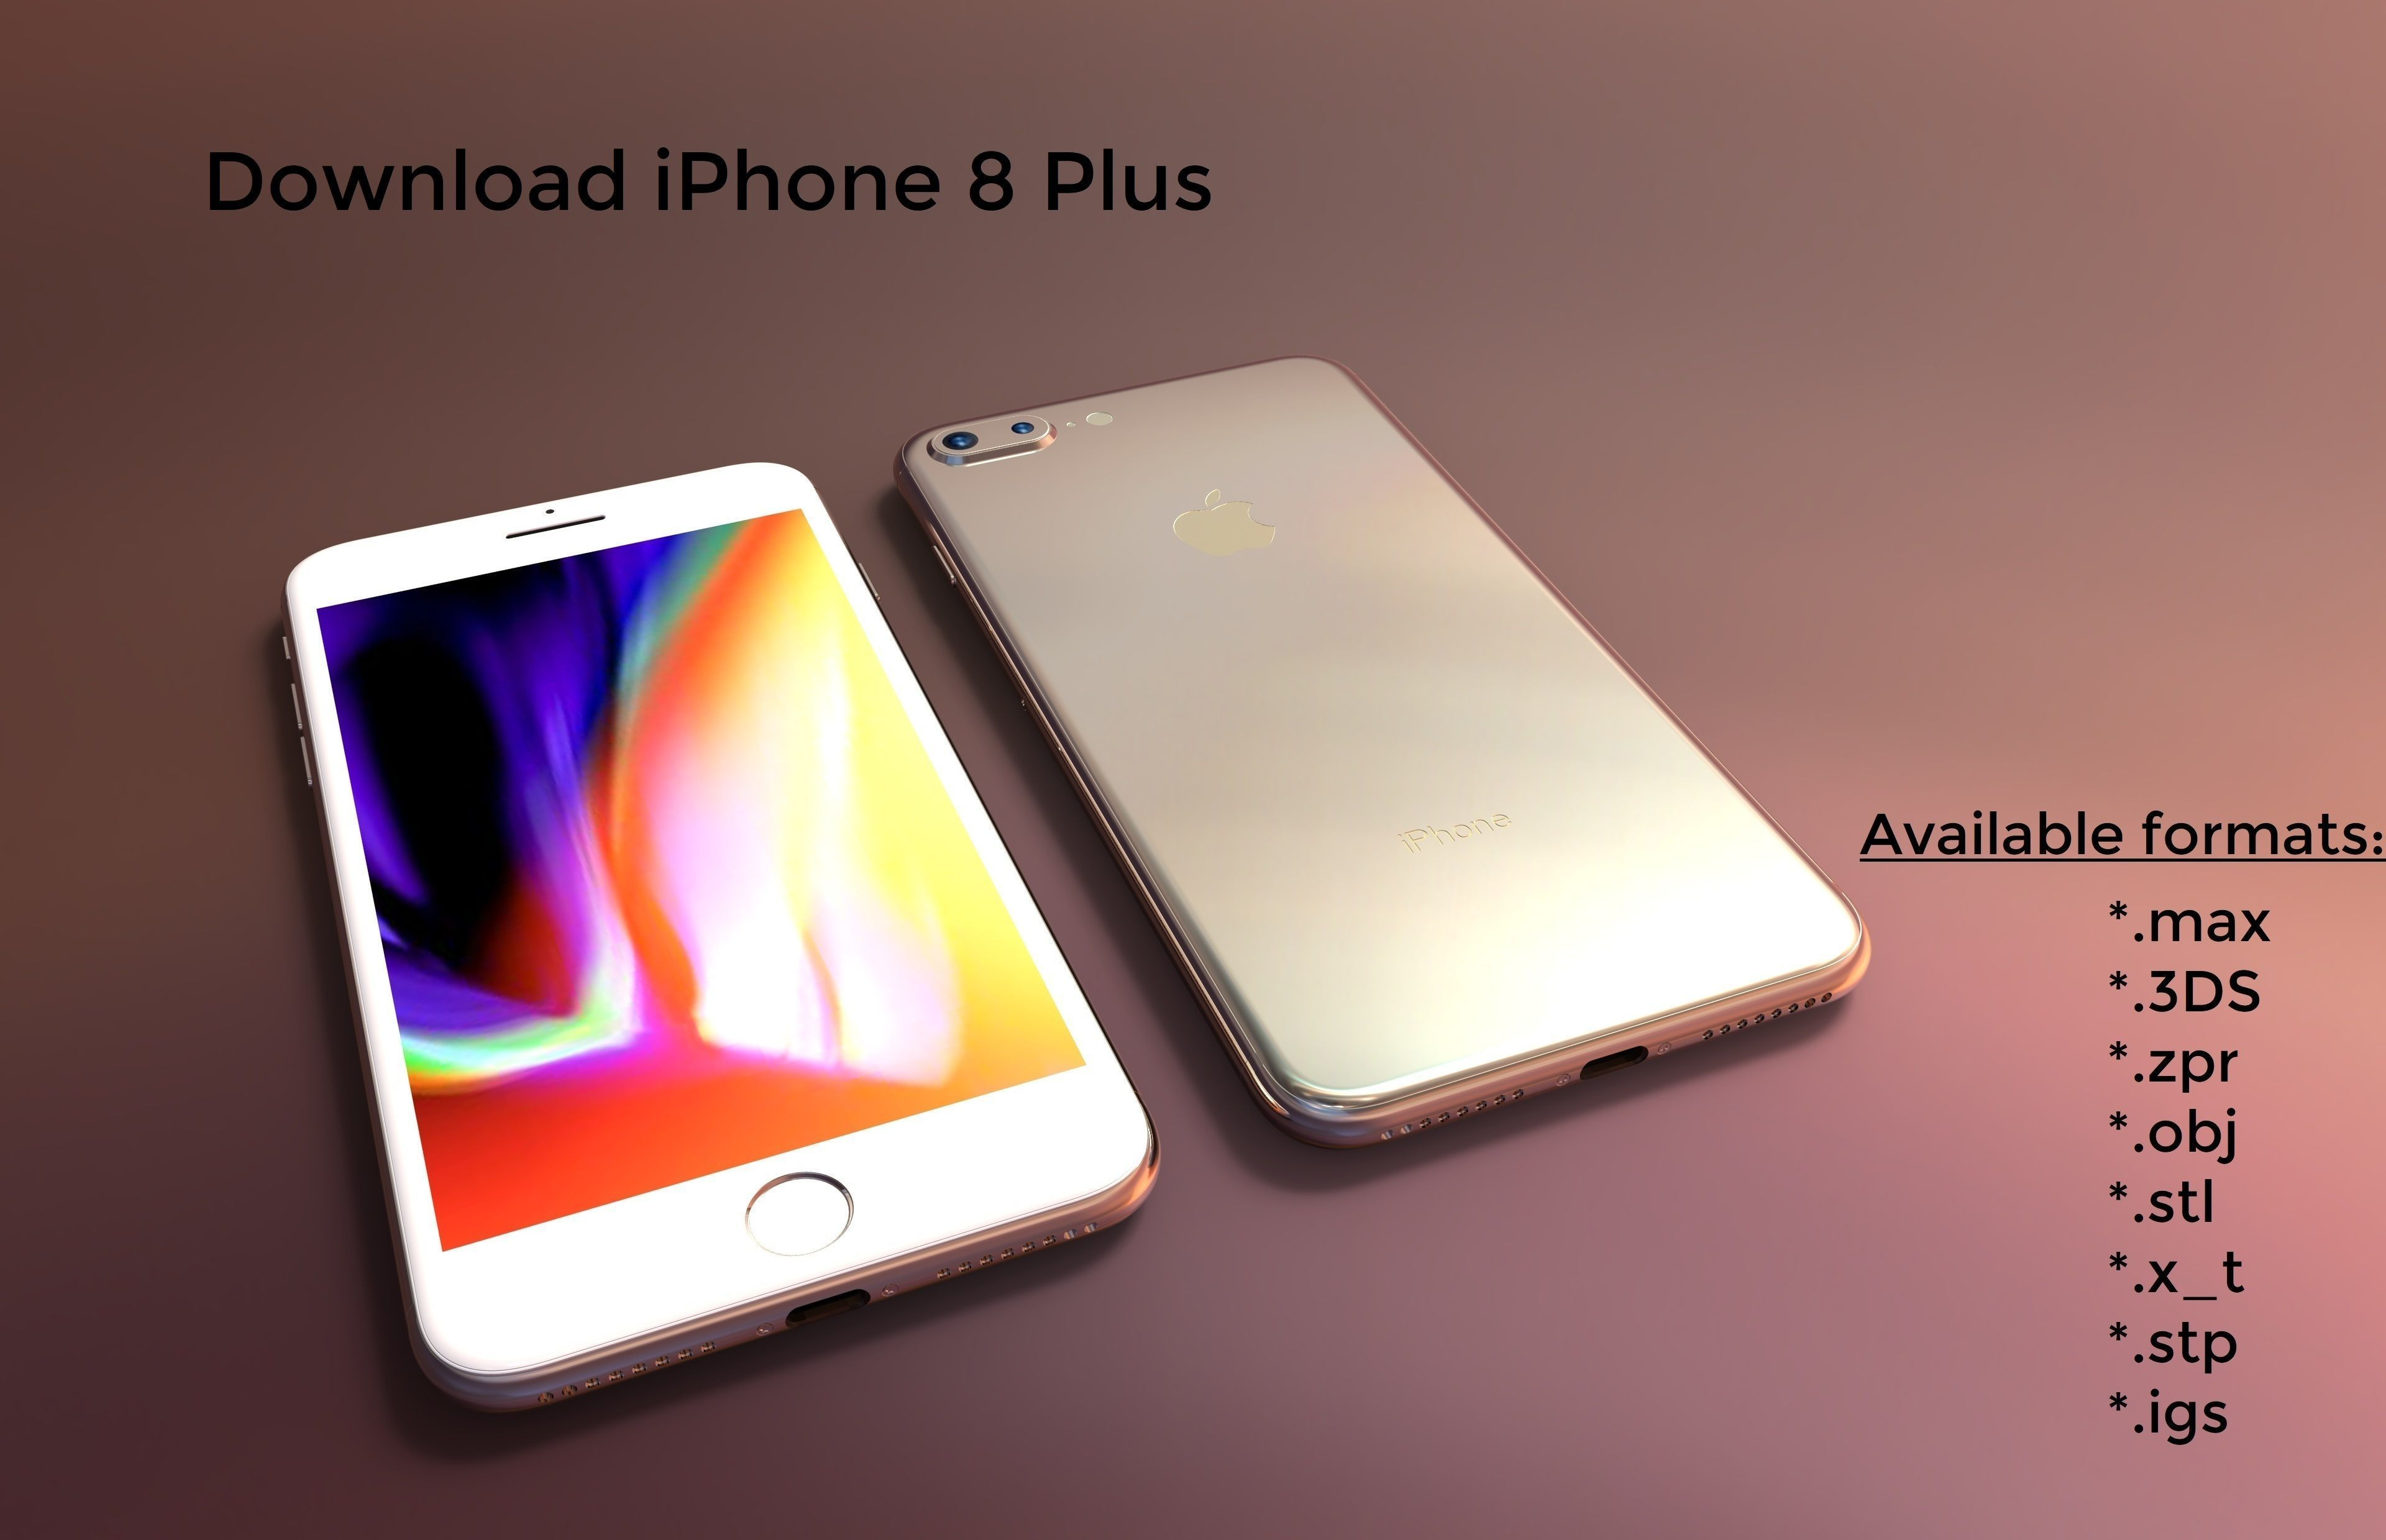 iPhone 8 Plus - original dimensions 3D model